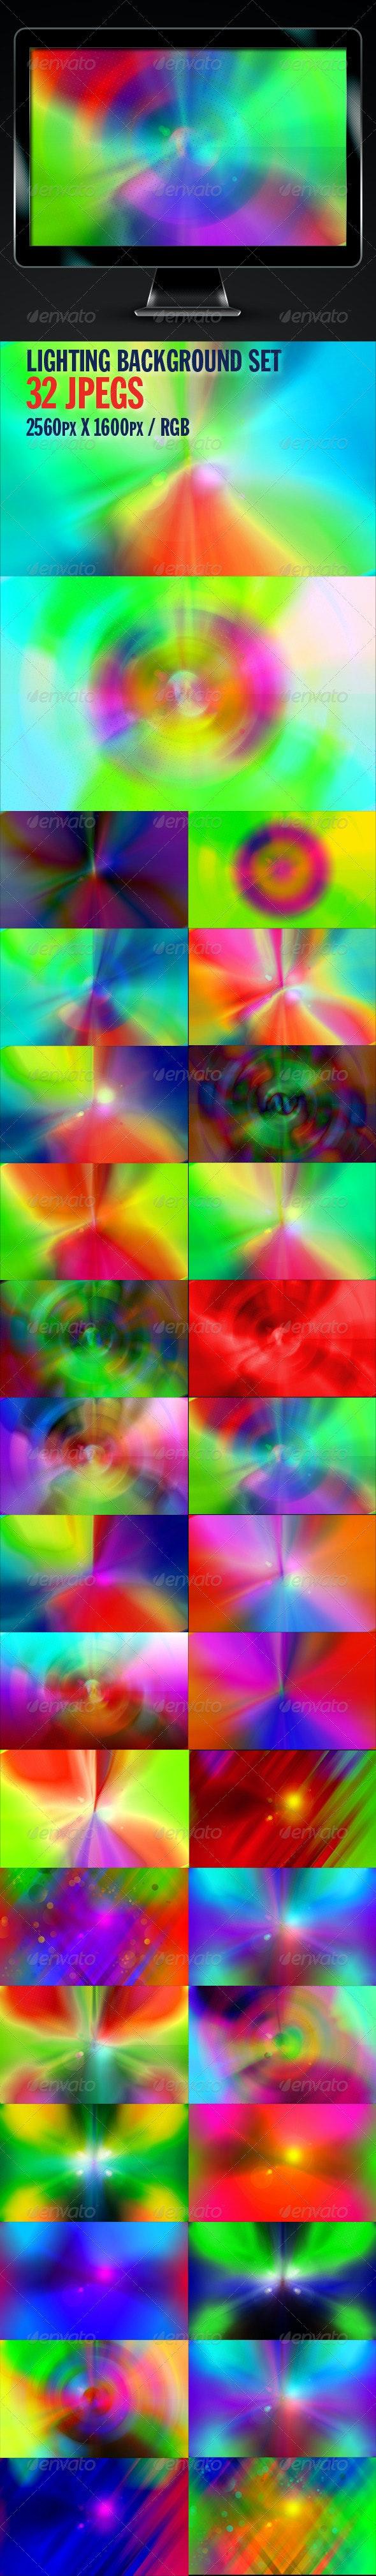 Lighting Backgrounds Set - Backgrounds Graphics